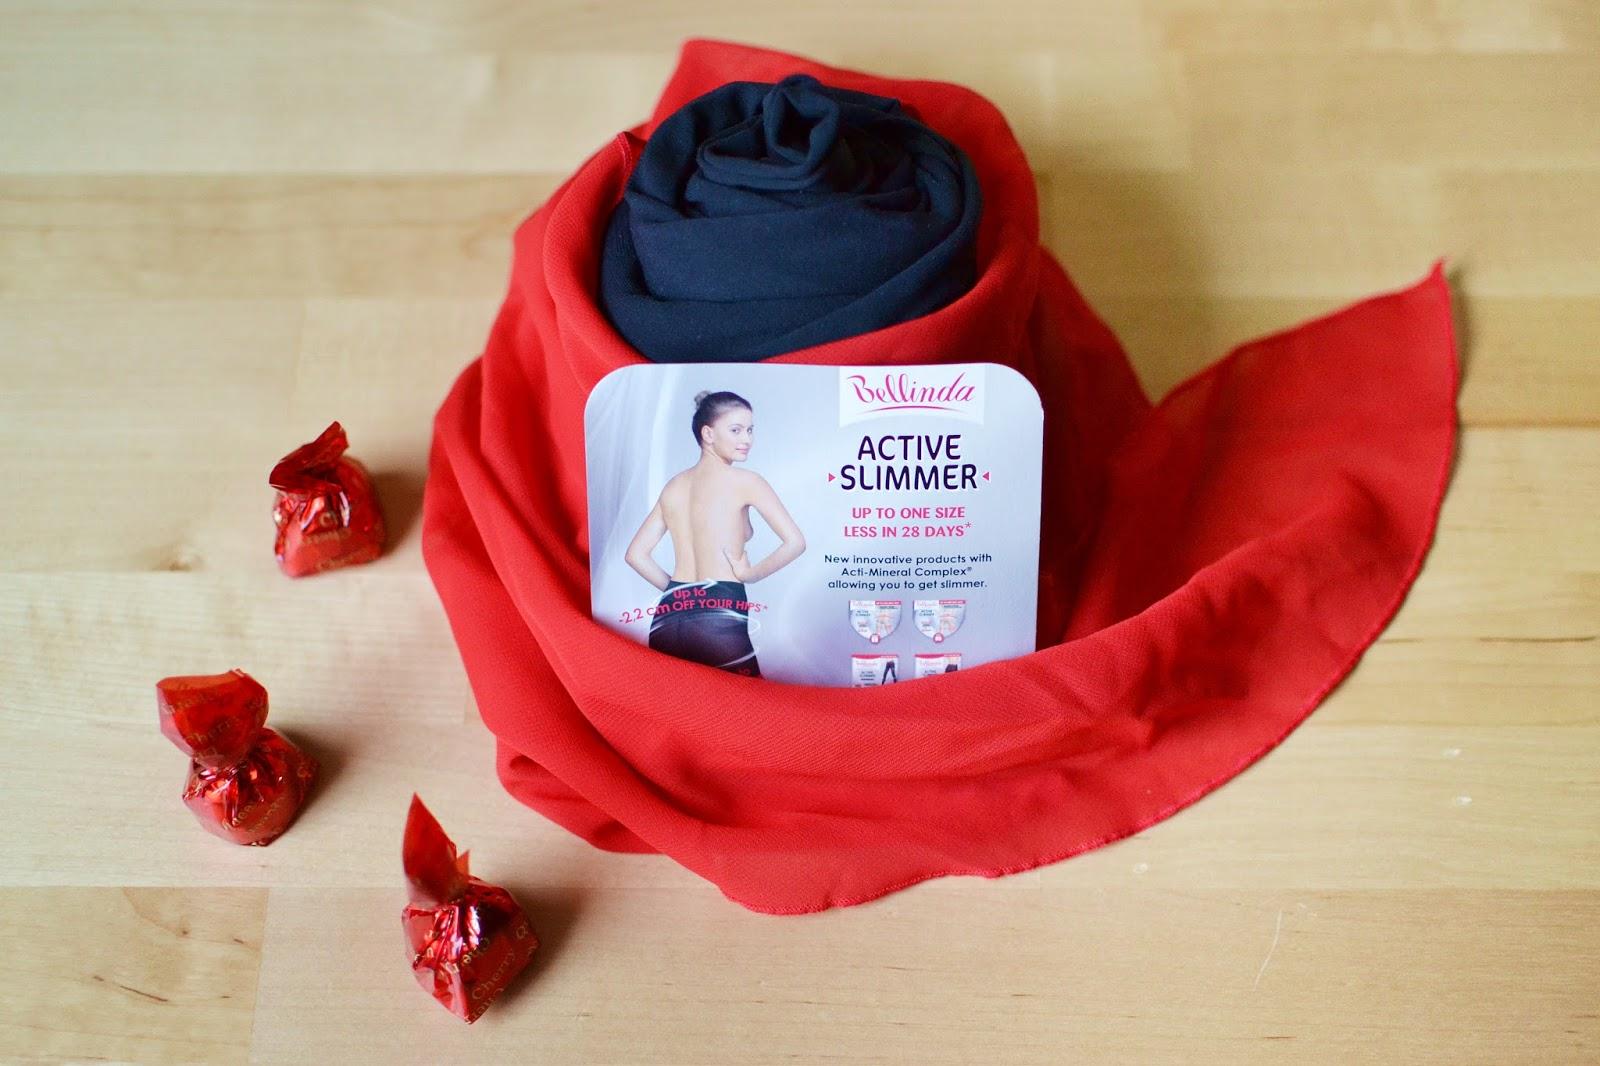 Bellinda Active Slimmer_Katharine-fashion is beautiful_Čierne inovatívne nočné legíny_Katarína Jakubčová_Fashion blogger